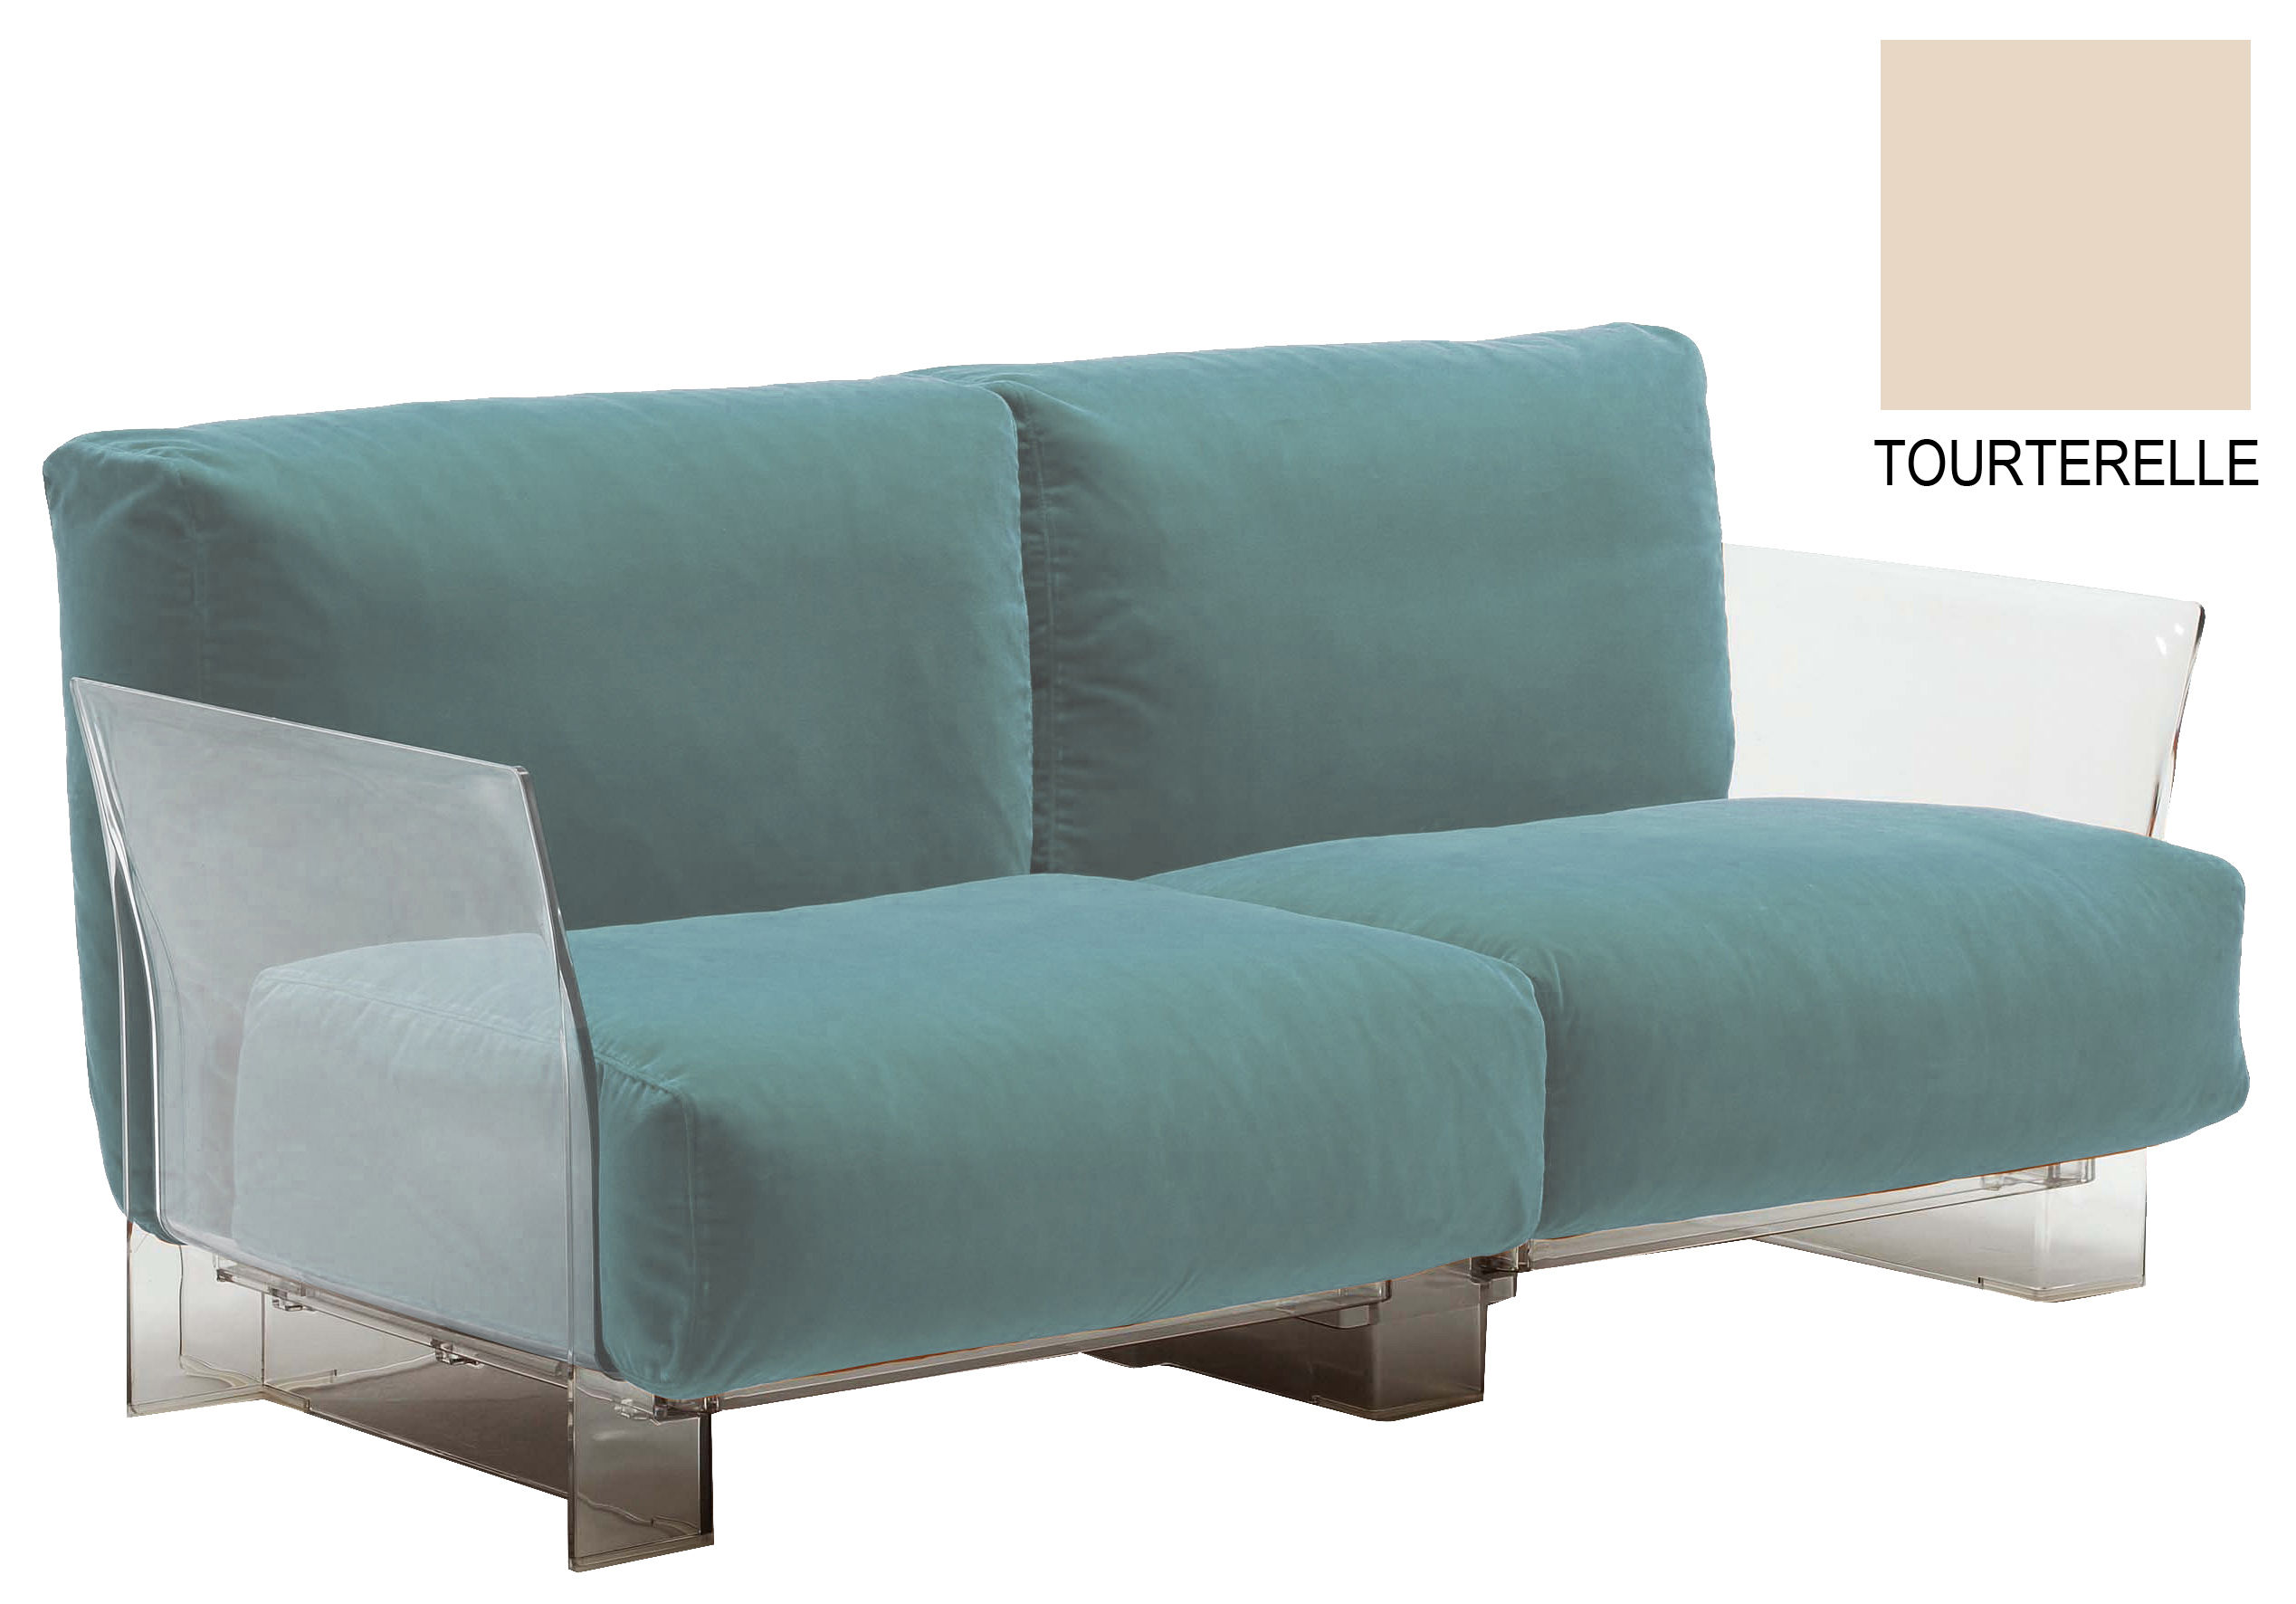 Möbel - Sofas - Pop Outdoor Sofa 2-Sitzer - Kartell - Taubenblau - Polykarbonat, Sunbrella-Gewebe